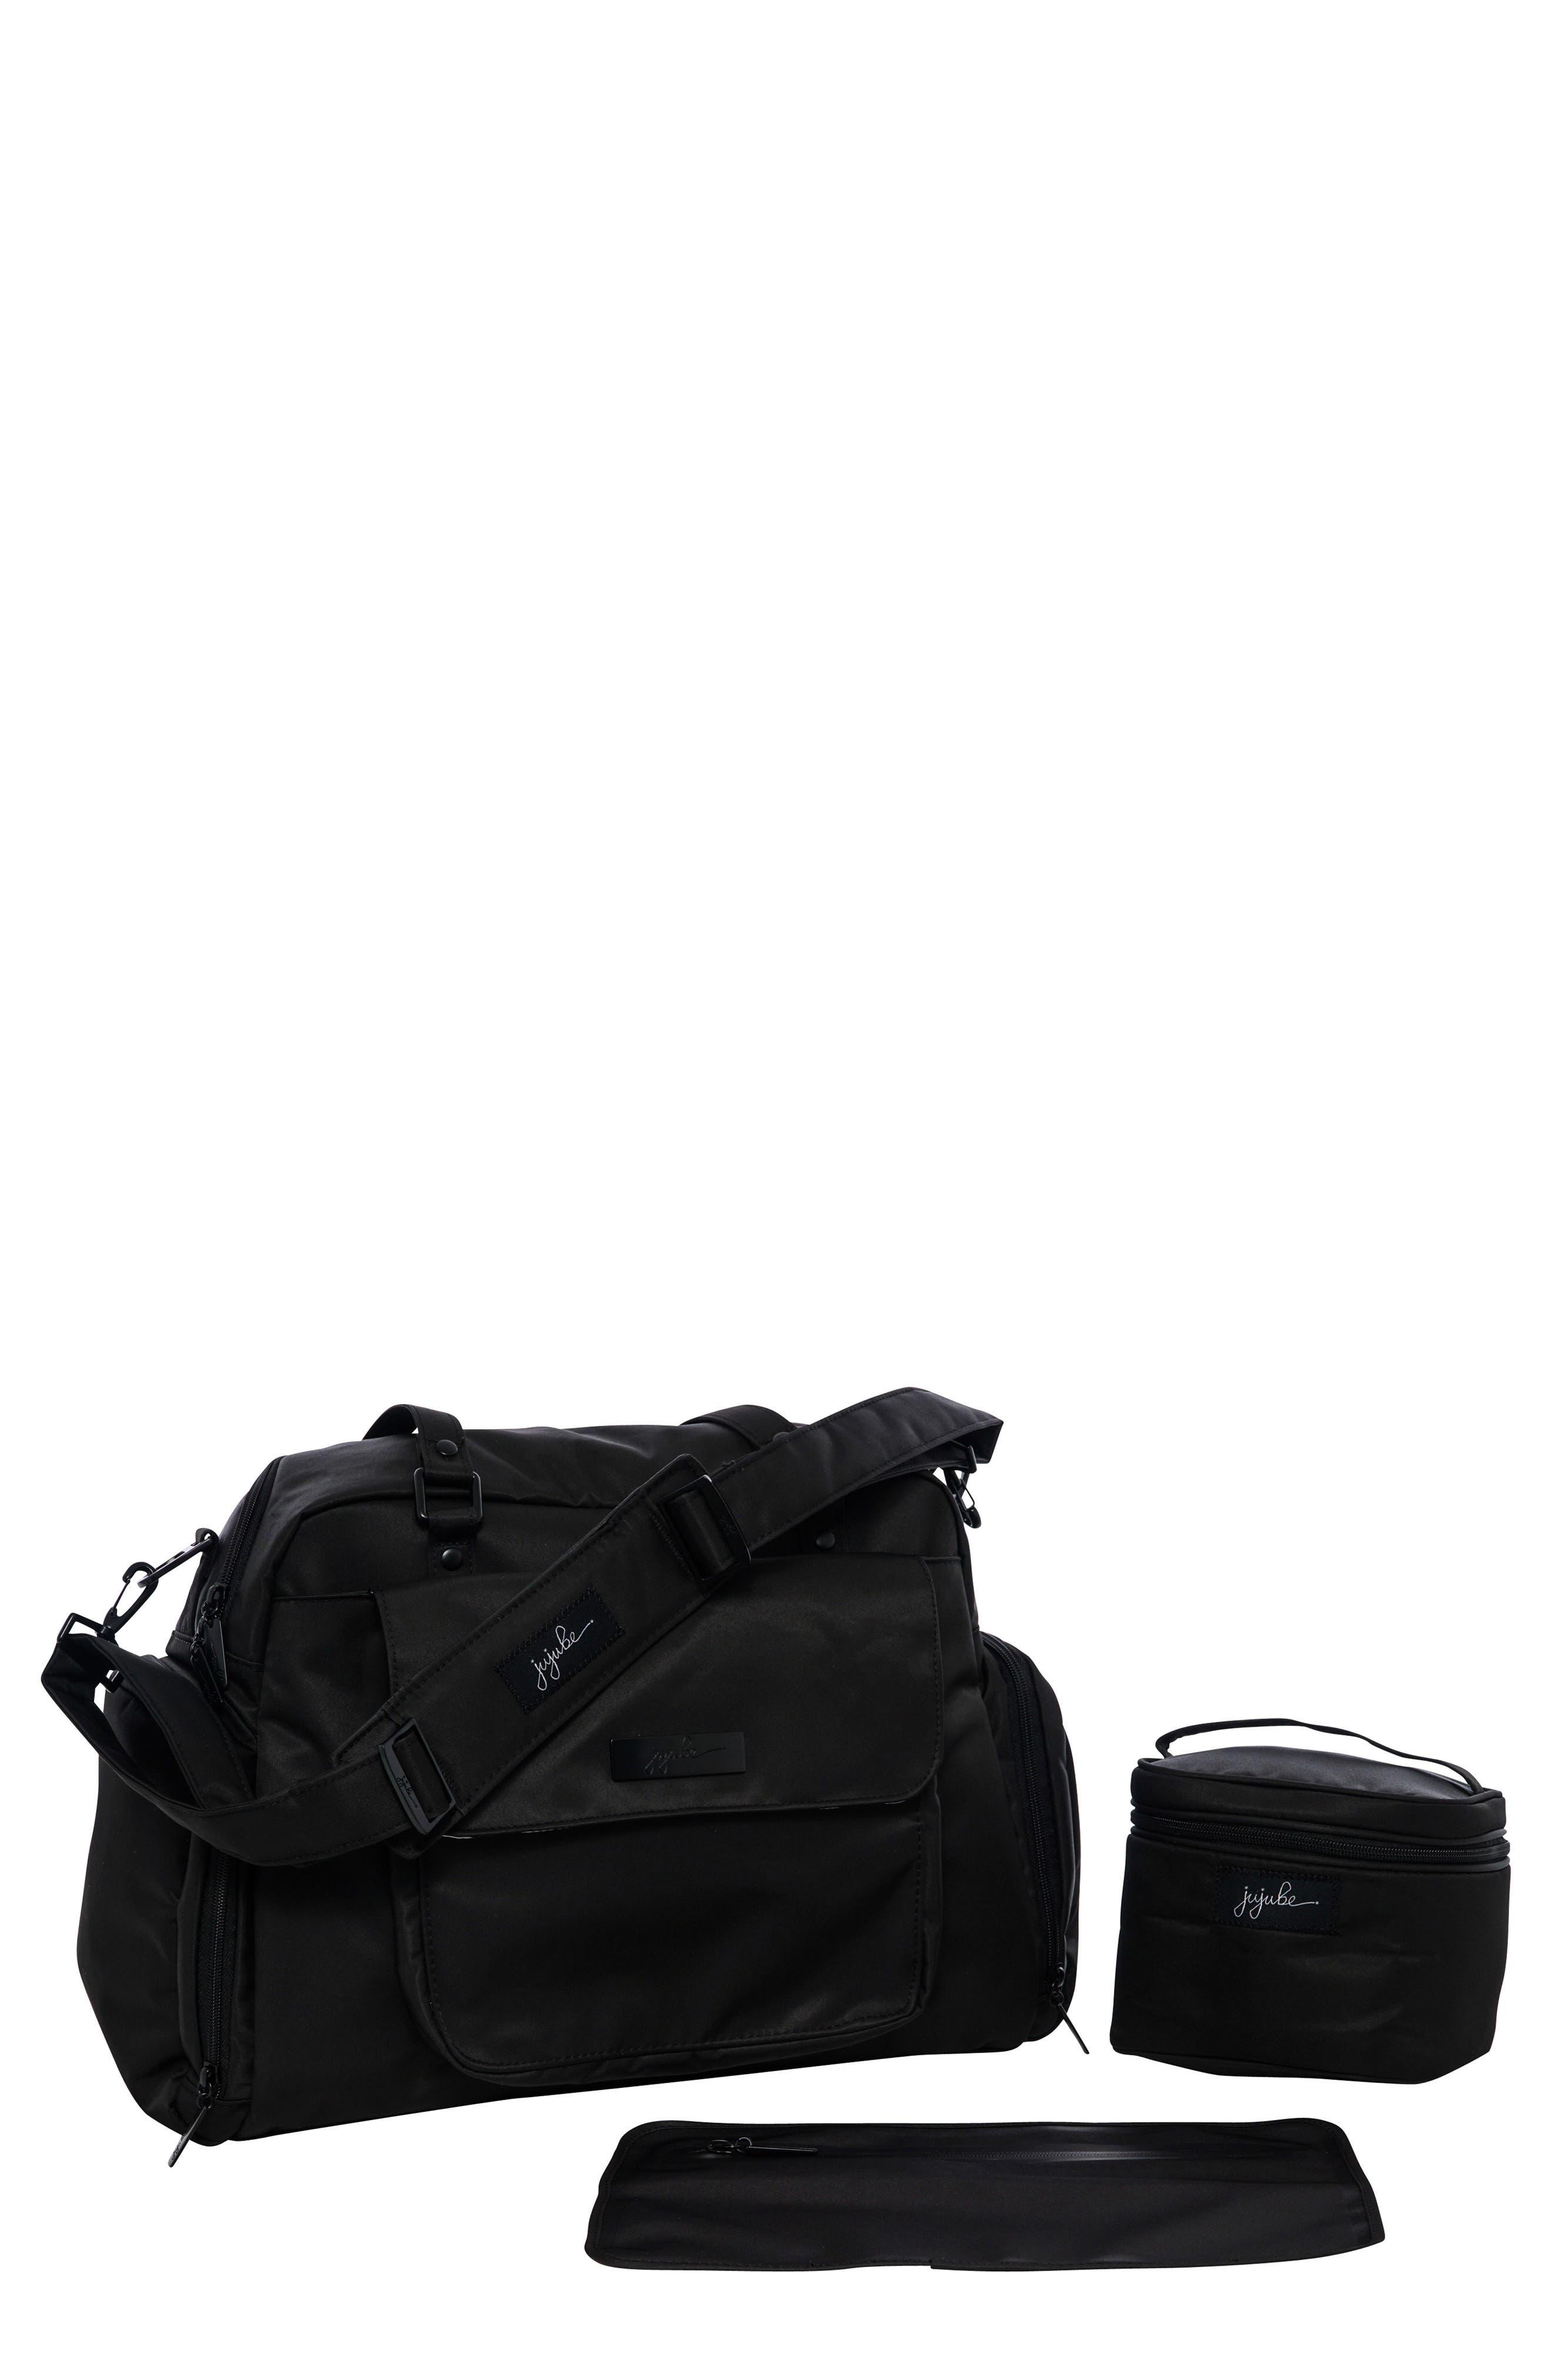 Onyx Be Pumped Bag,                             Main thumbnail 1, color,                             BLACK OUT